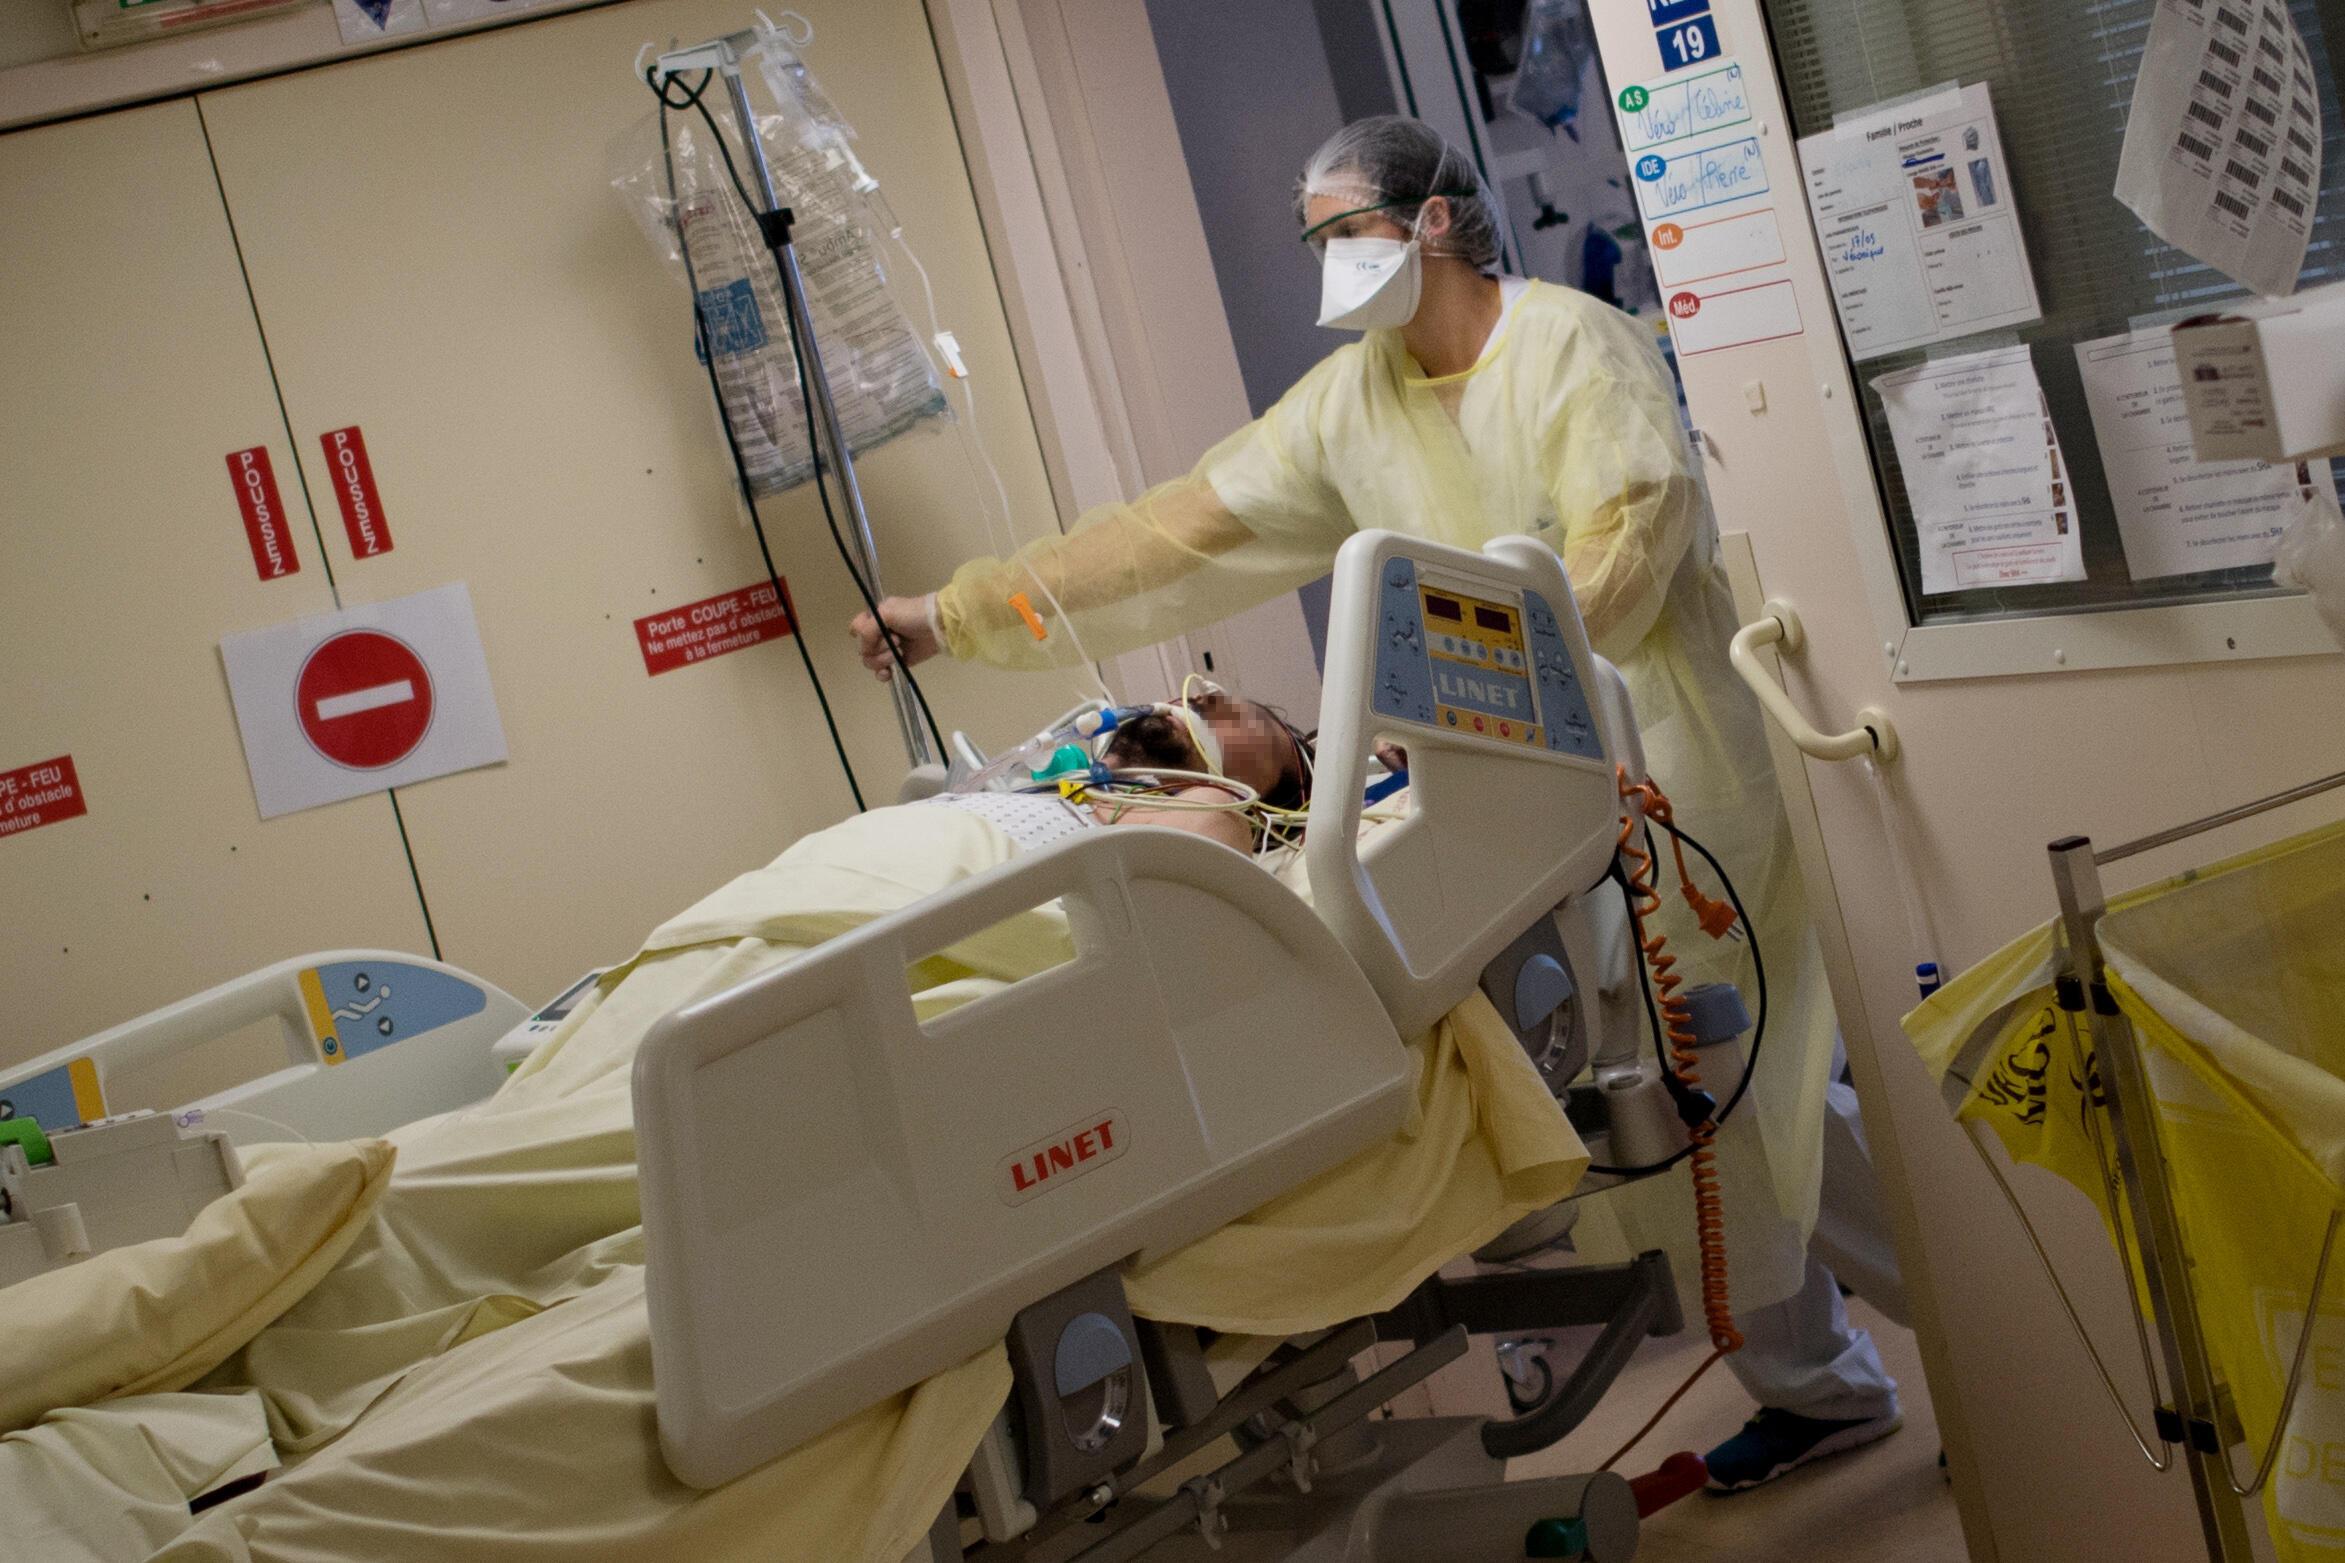 malade coronavirus france nantes